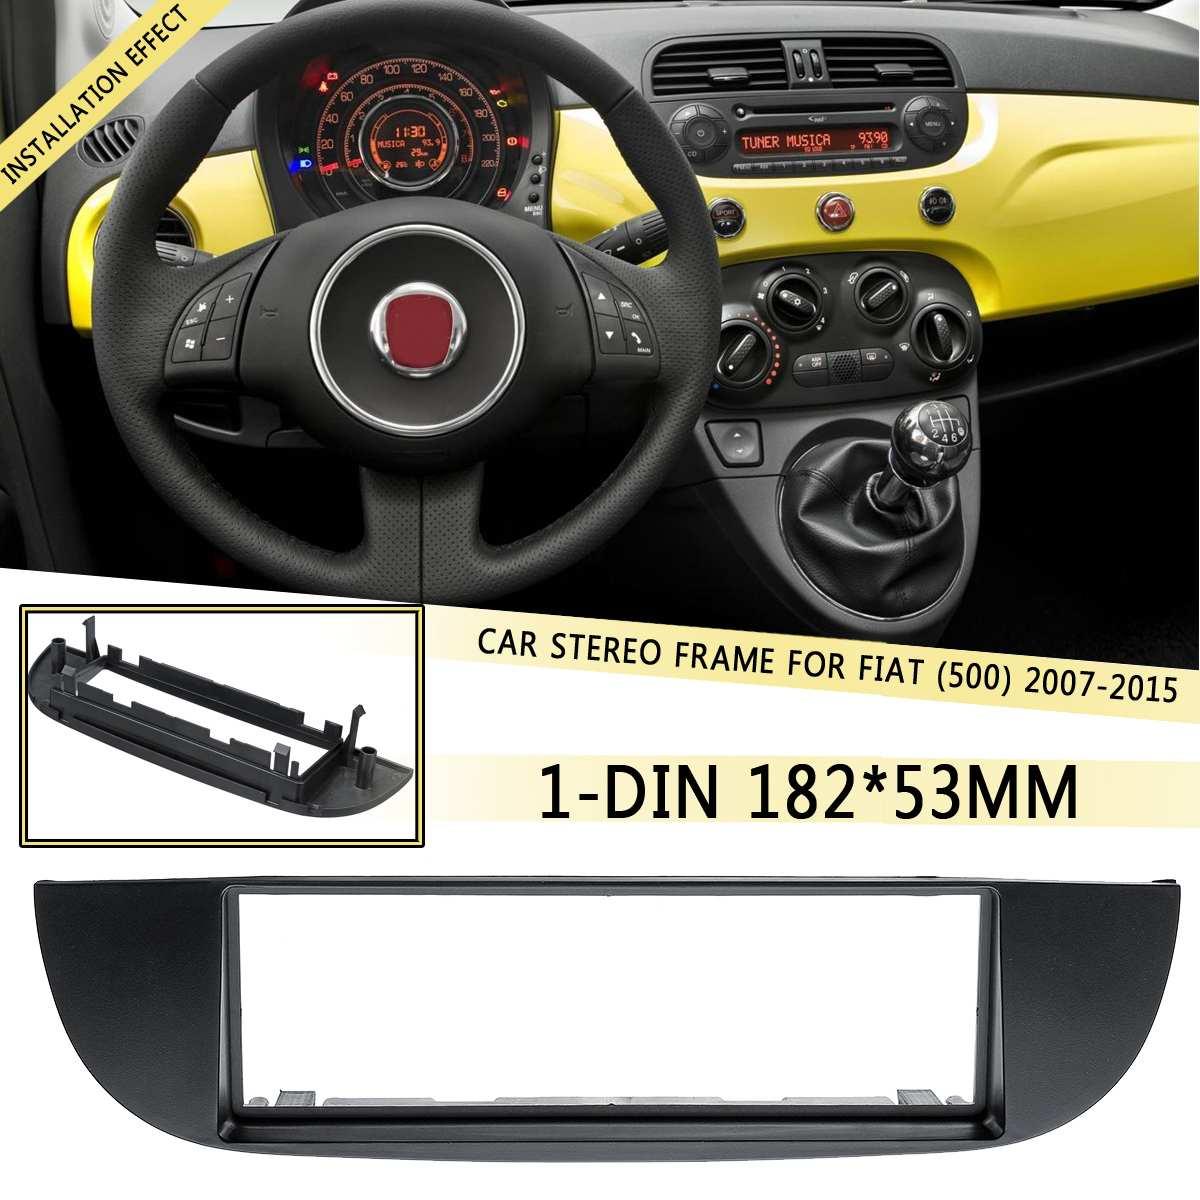 1 DIN coche DVD/CD Radio Estéreo marco para salpicadero Panel Trim adaptador Dash kit para Fiat (500) 2007, 2008, 2009, 2010, 2011, 2012-2015 182x53mm